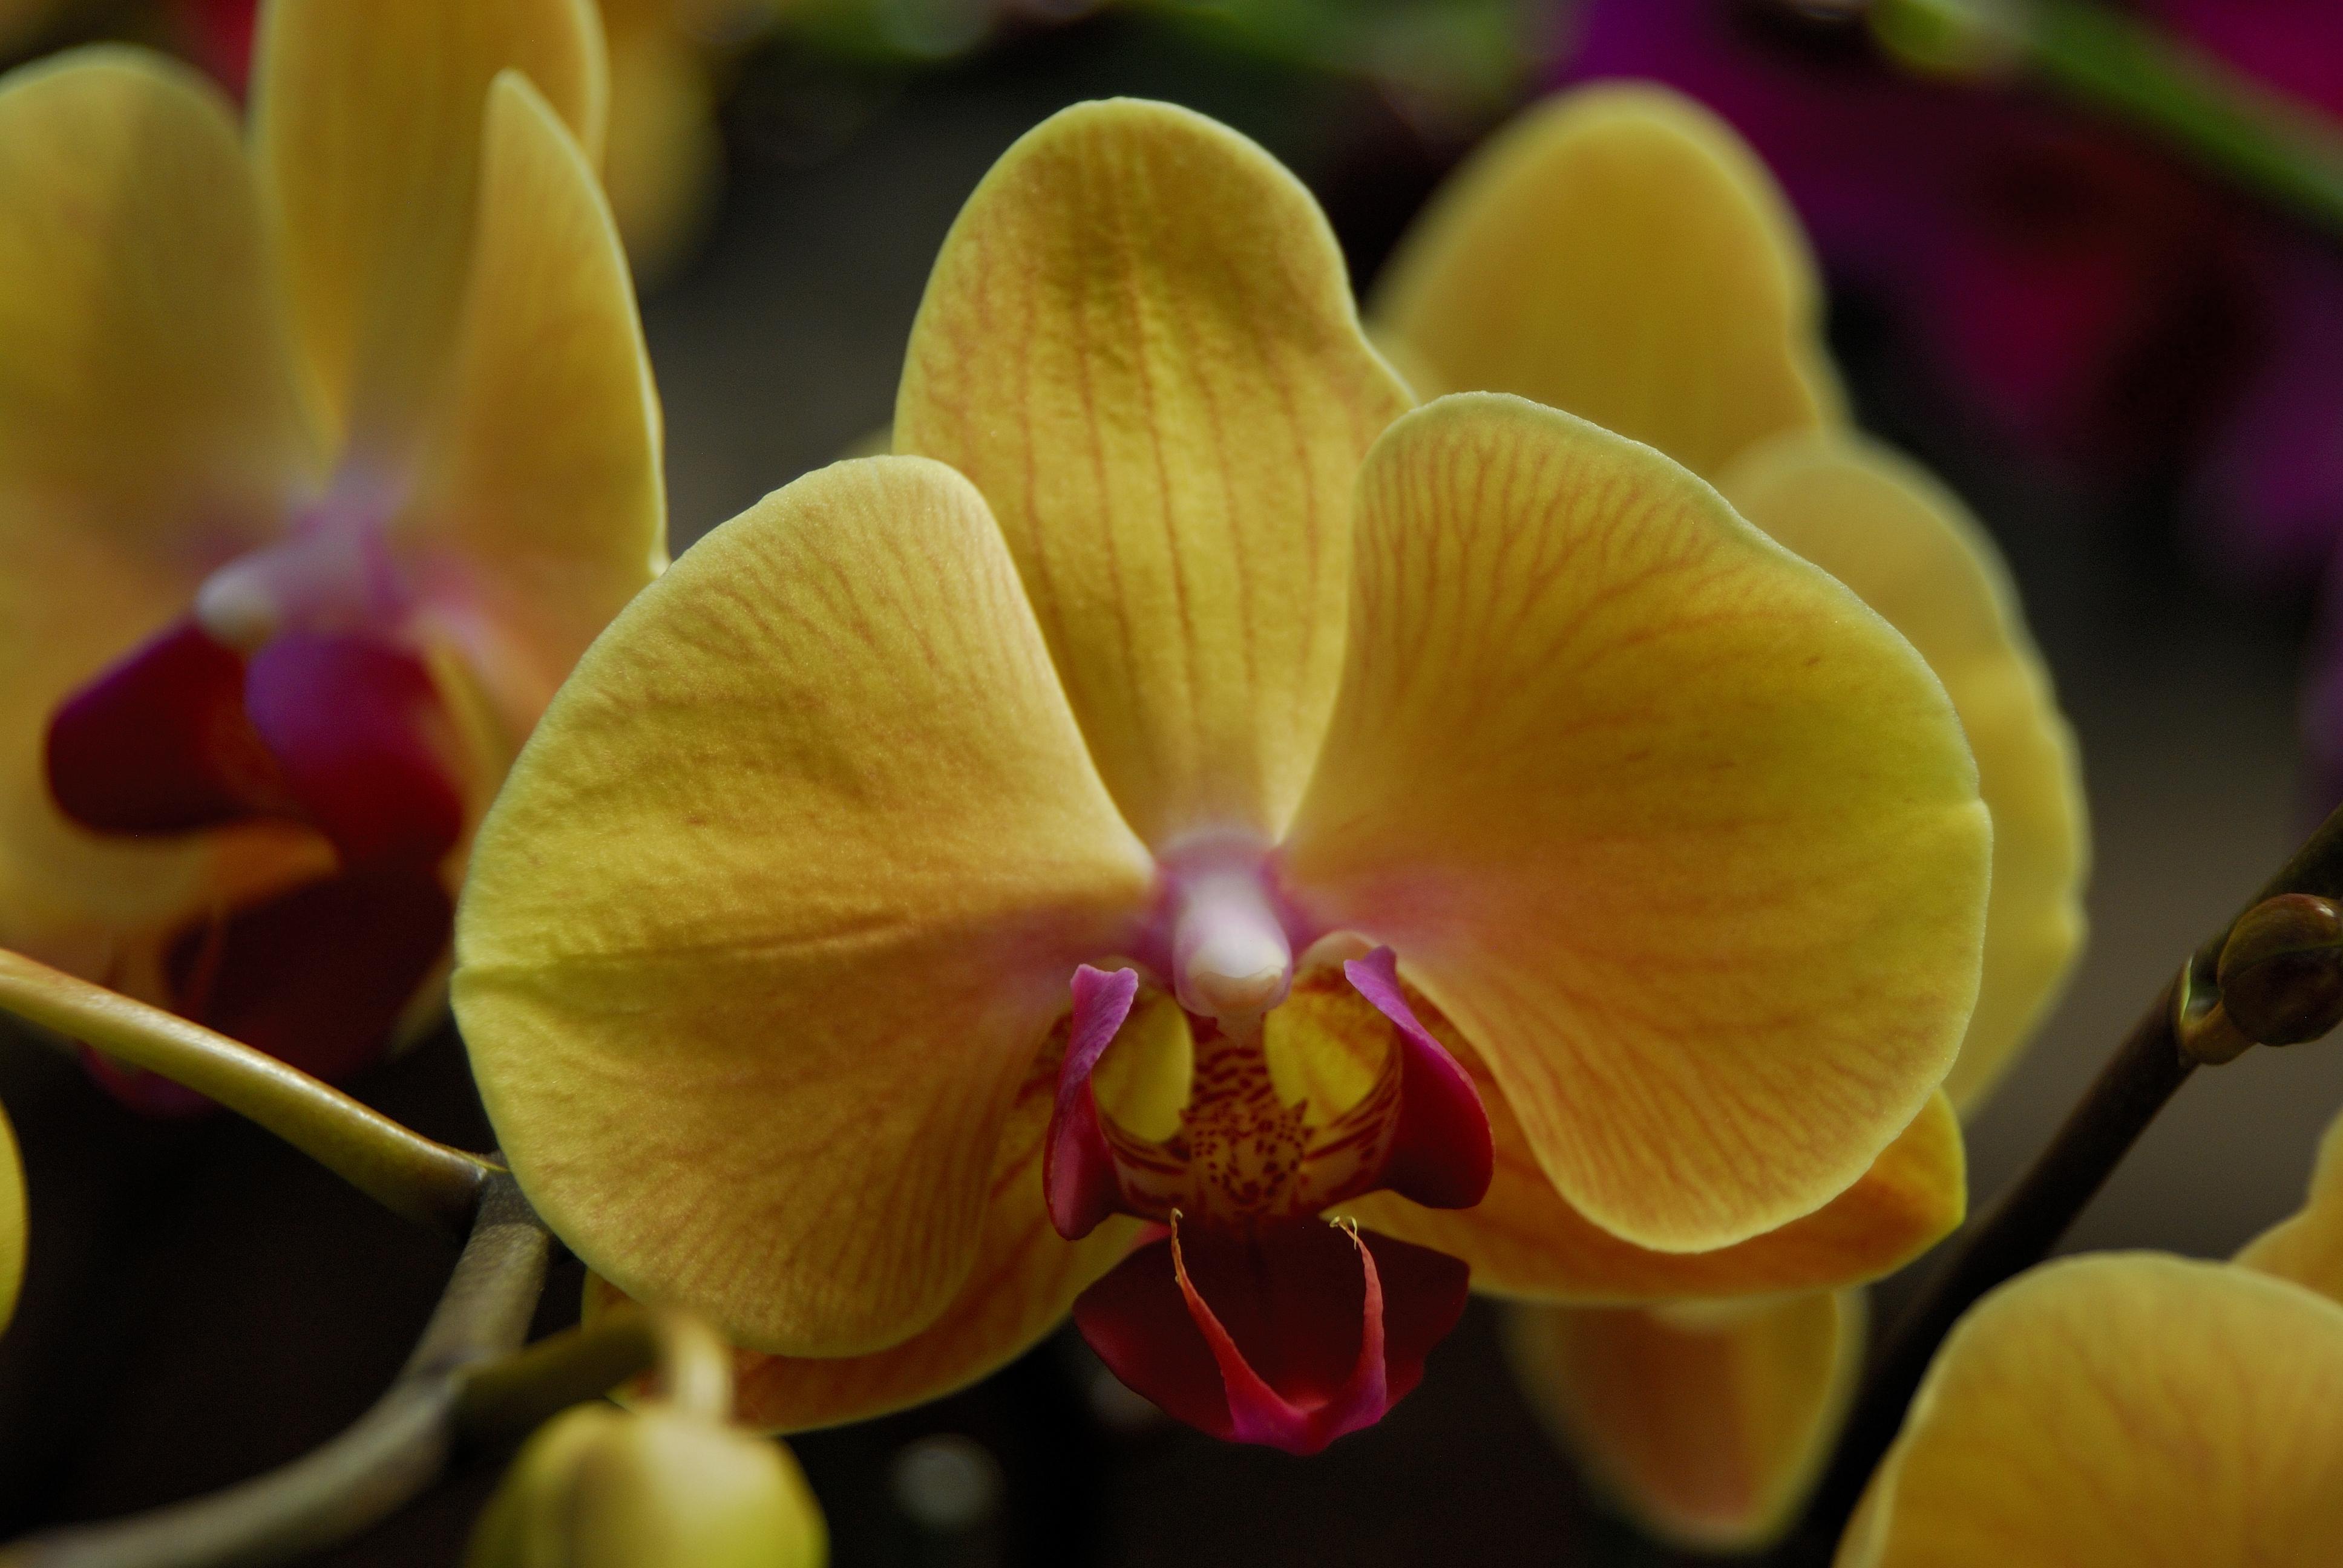 Shenzhen Nongke Orchid HD Pics